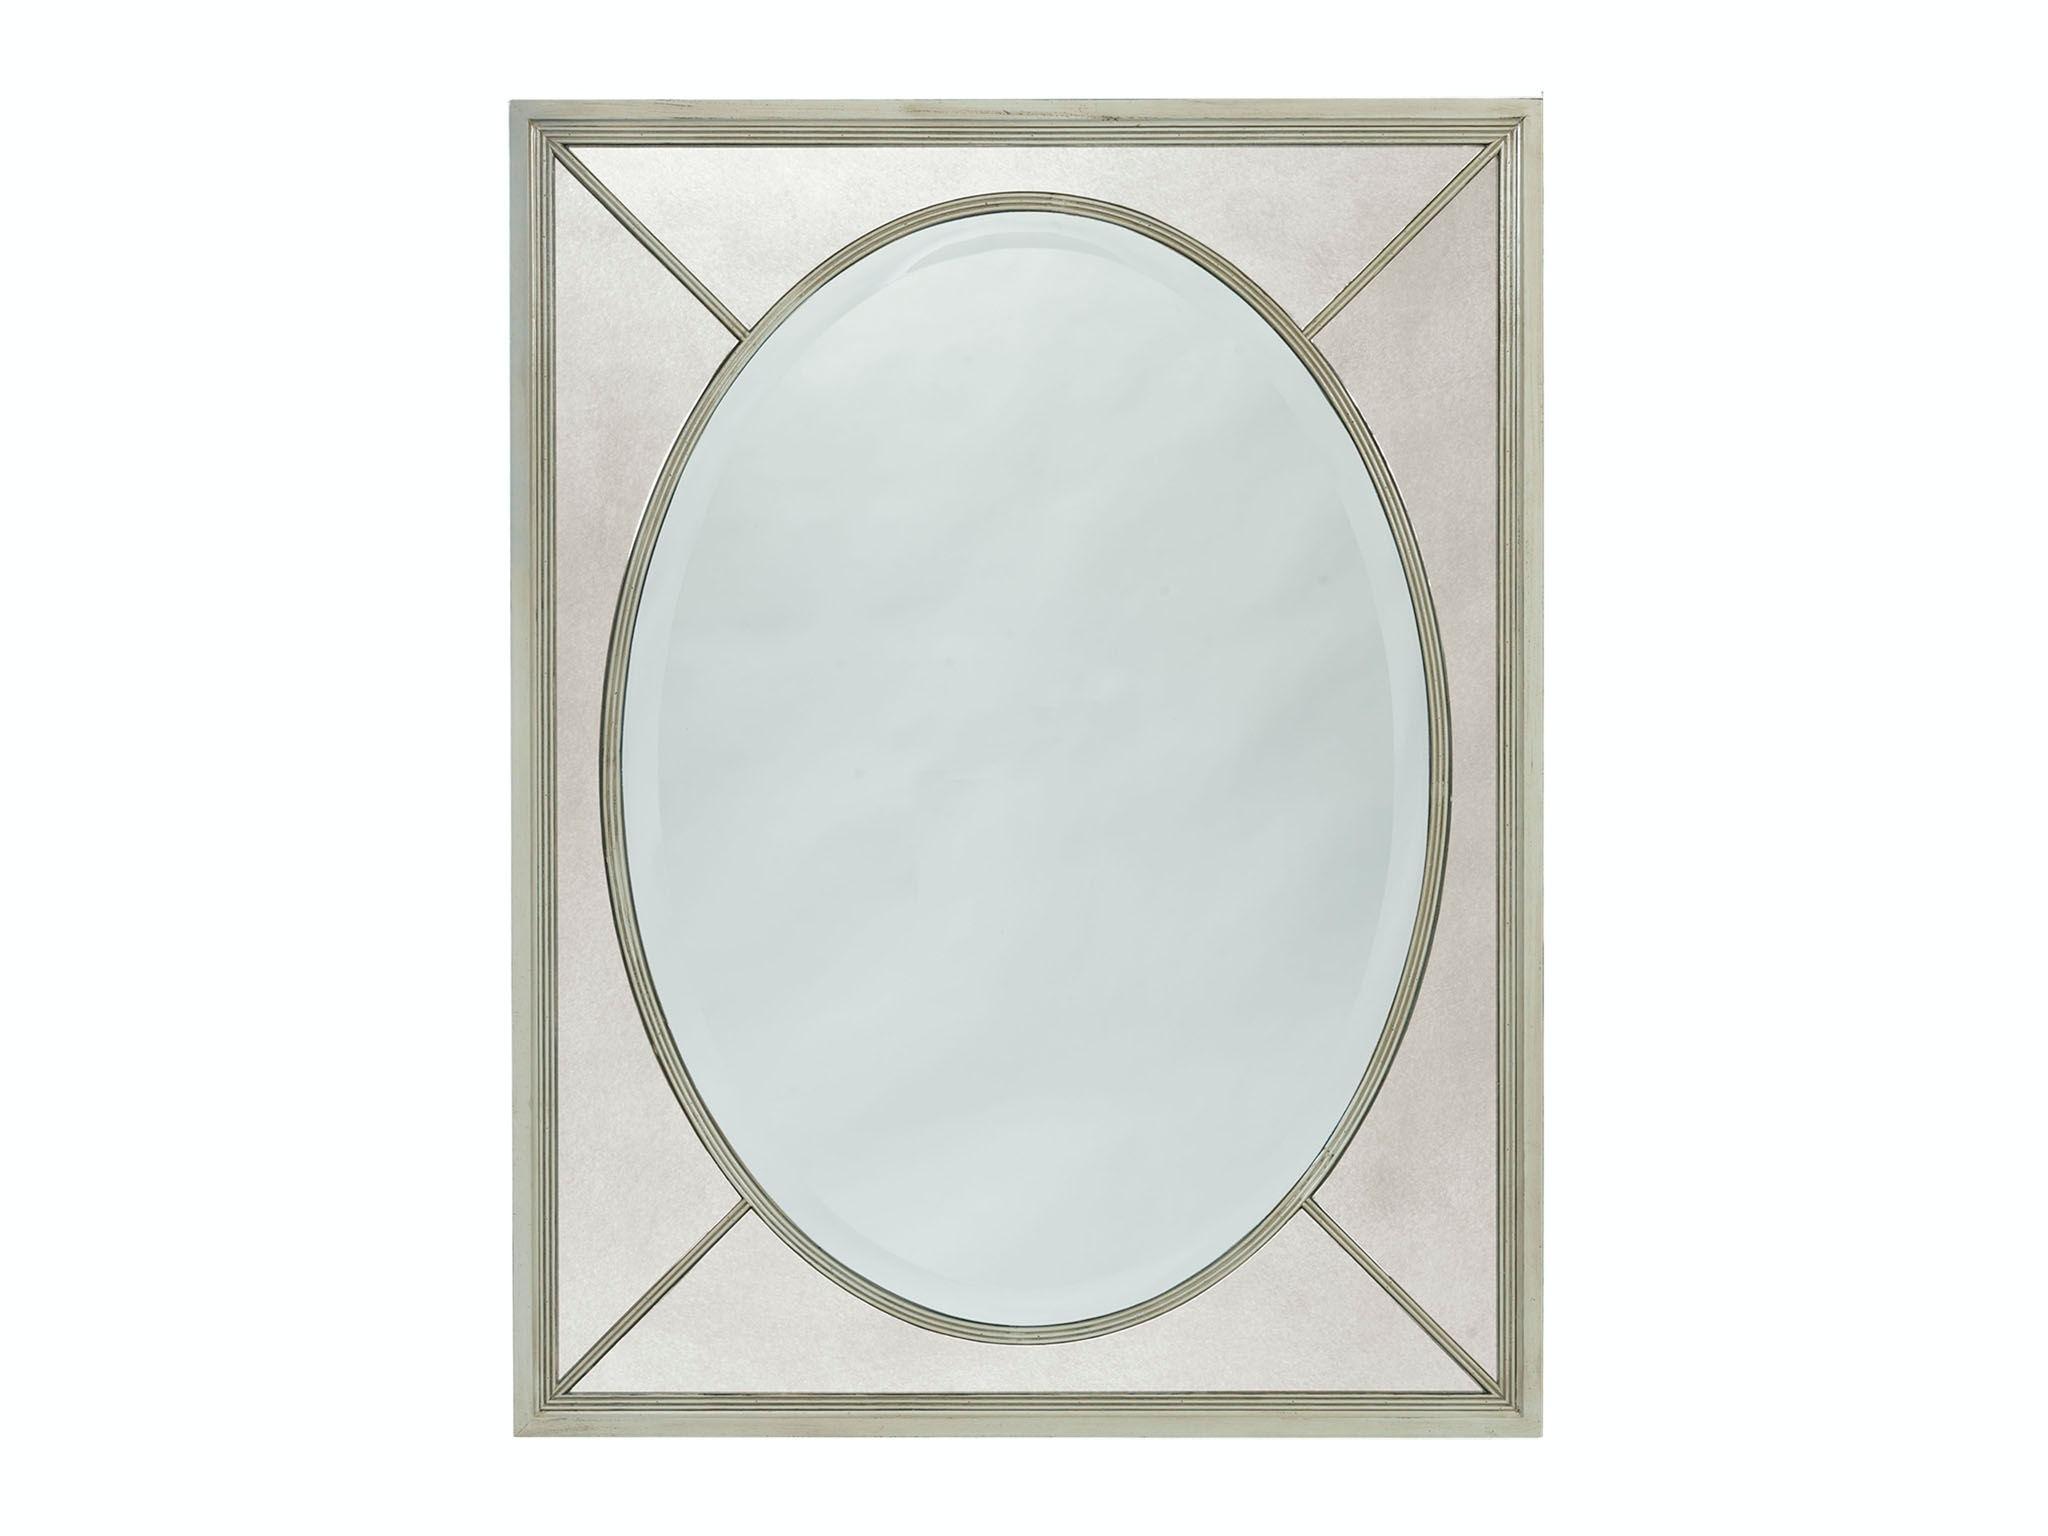 Drexel Heritage Accessories Illumination Mirror 550 400